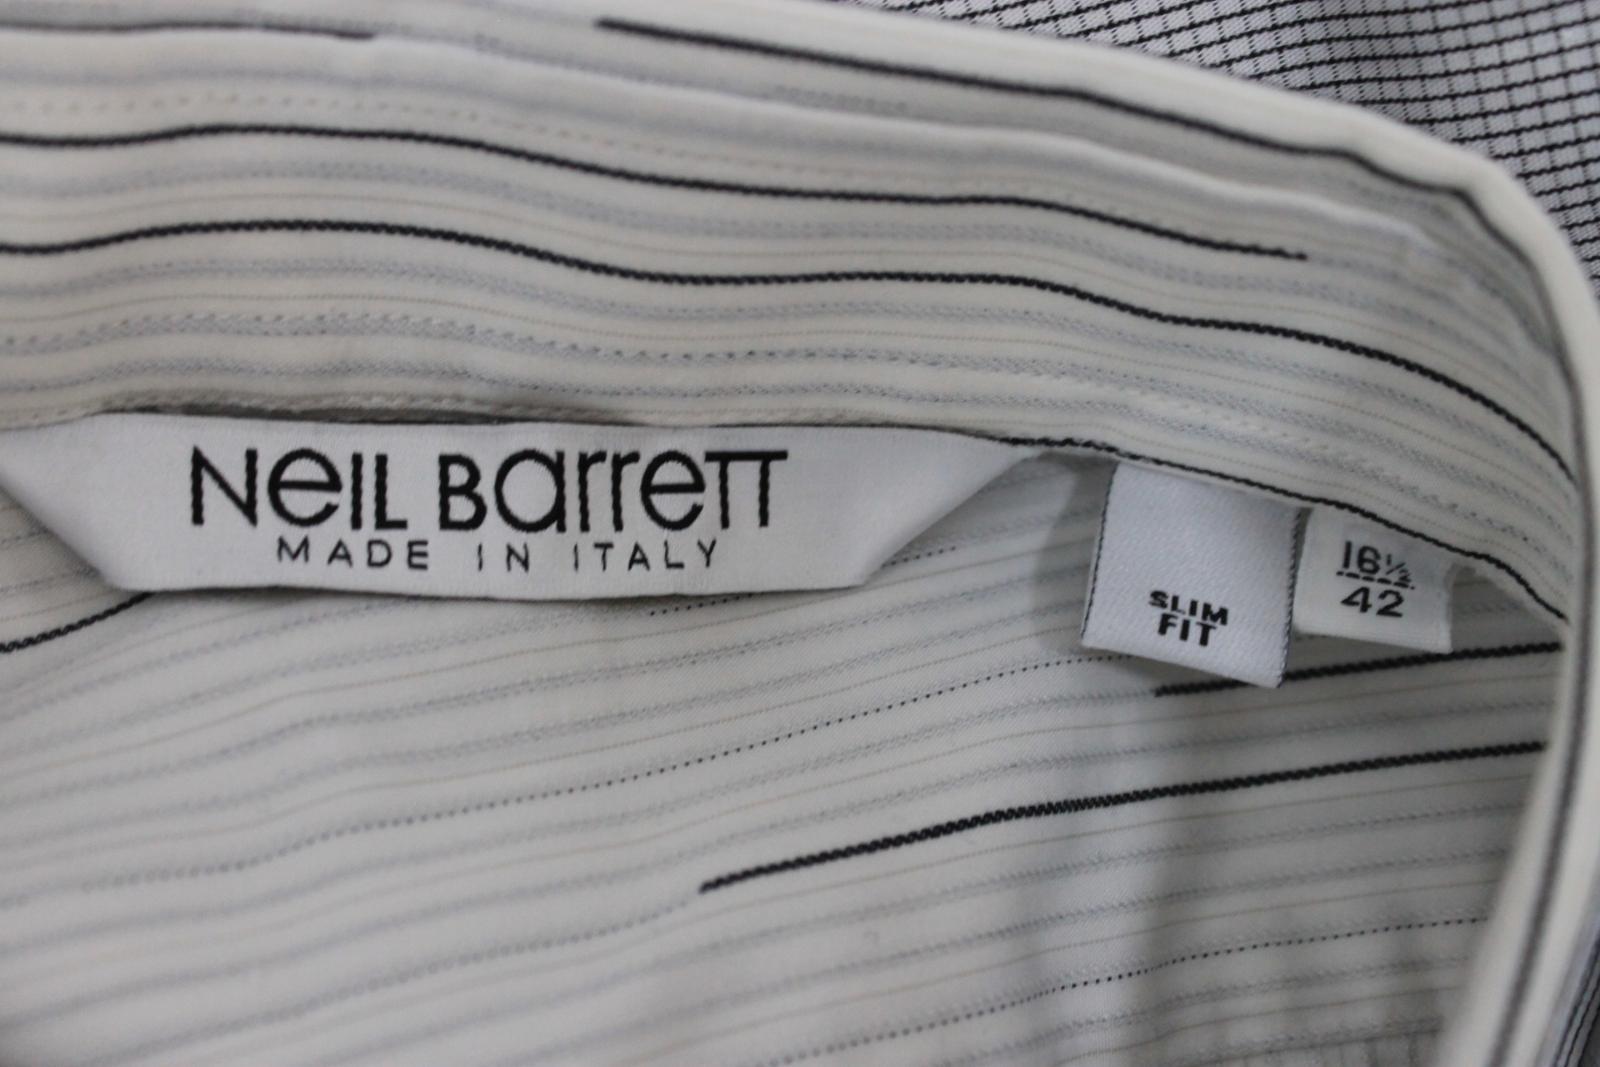 Neil-Barrett-Hombre-Blanco-Algodon-De-Rayas-Camisa-De-Manga-Corta-Estampado-de-bolsillo-16-5-034 miniatura 10